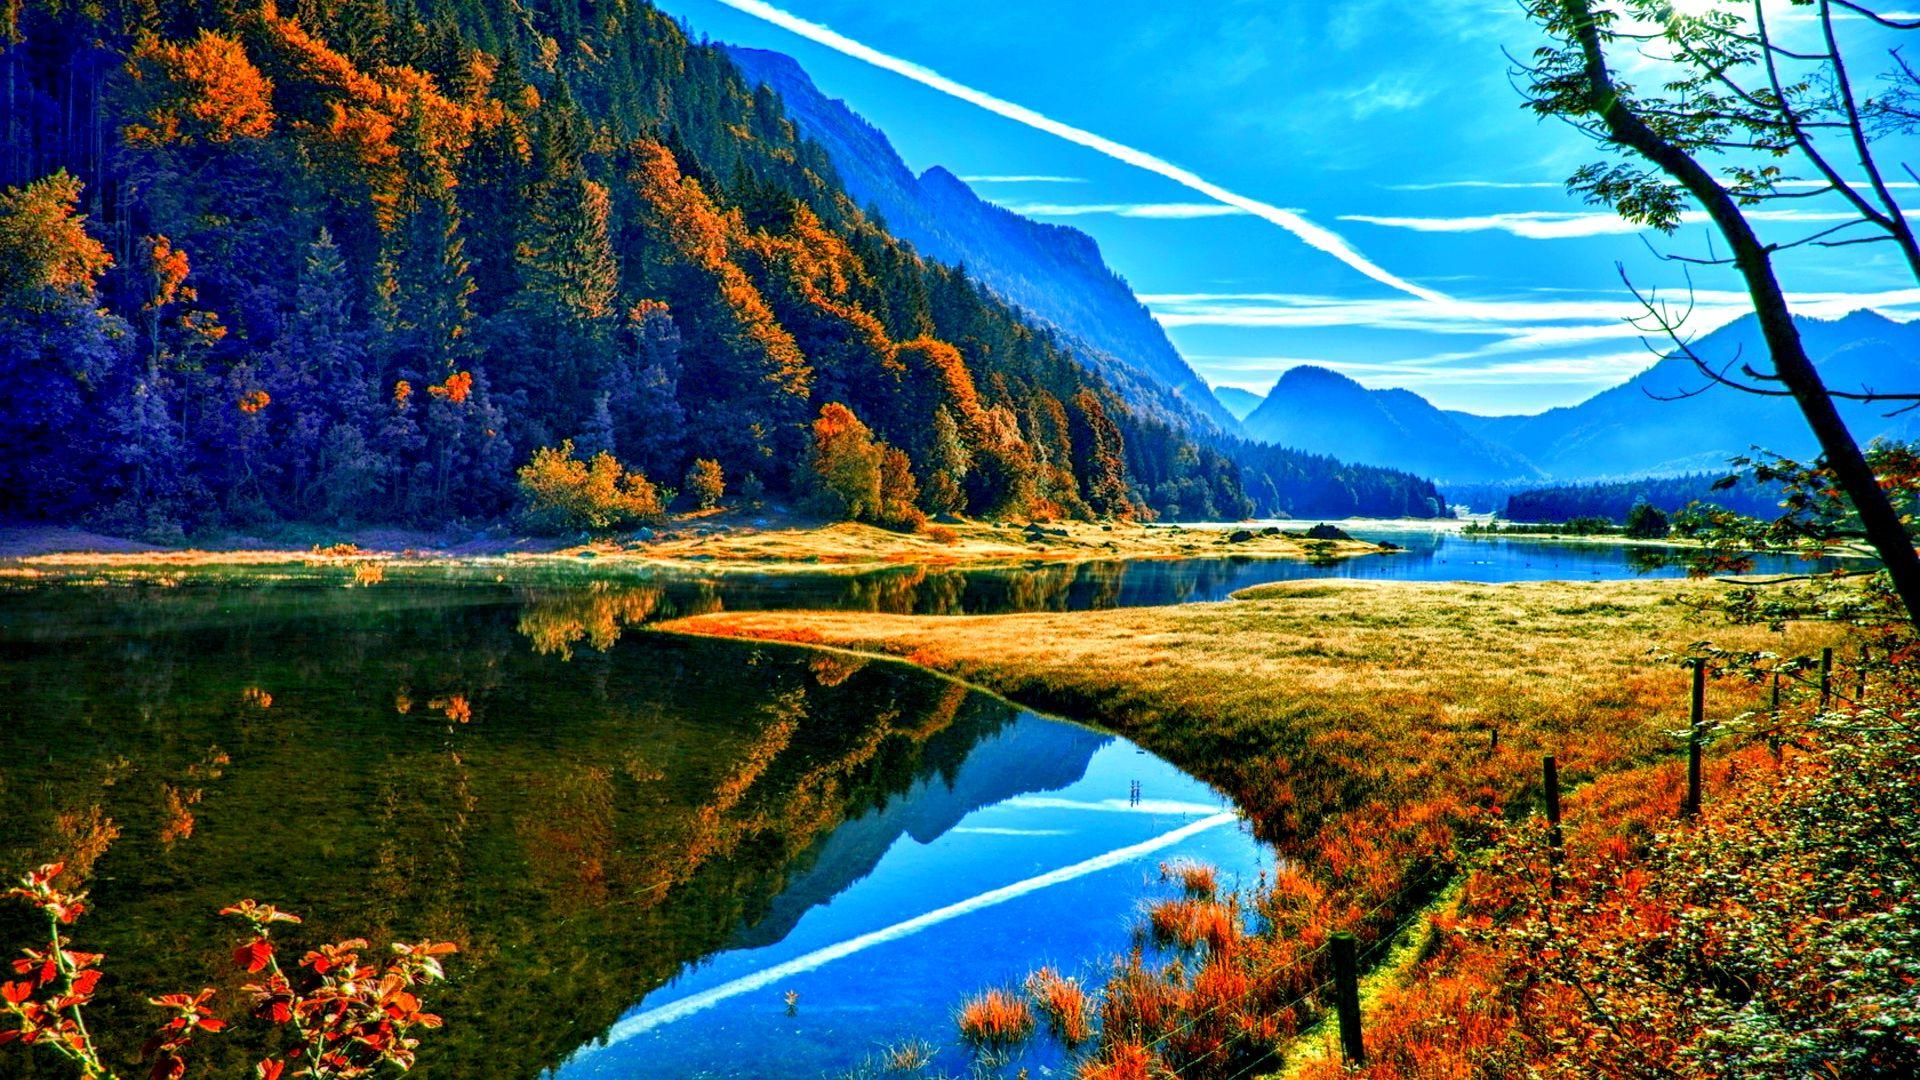 Hd wallpaper nature 1920x1080 - Amazing View Of Lake Autumn Hd Desktop Wallpaper Mobile Dual